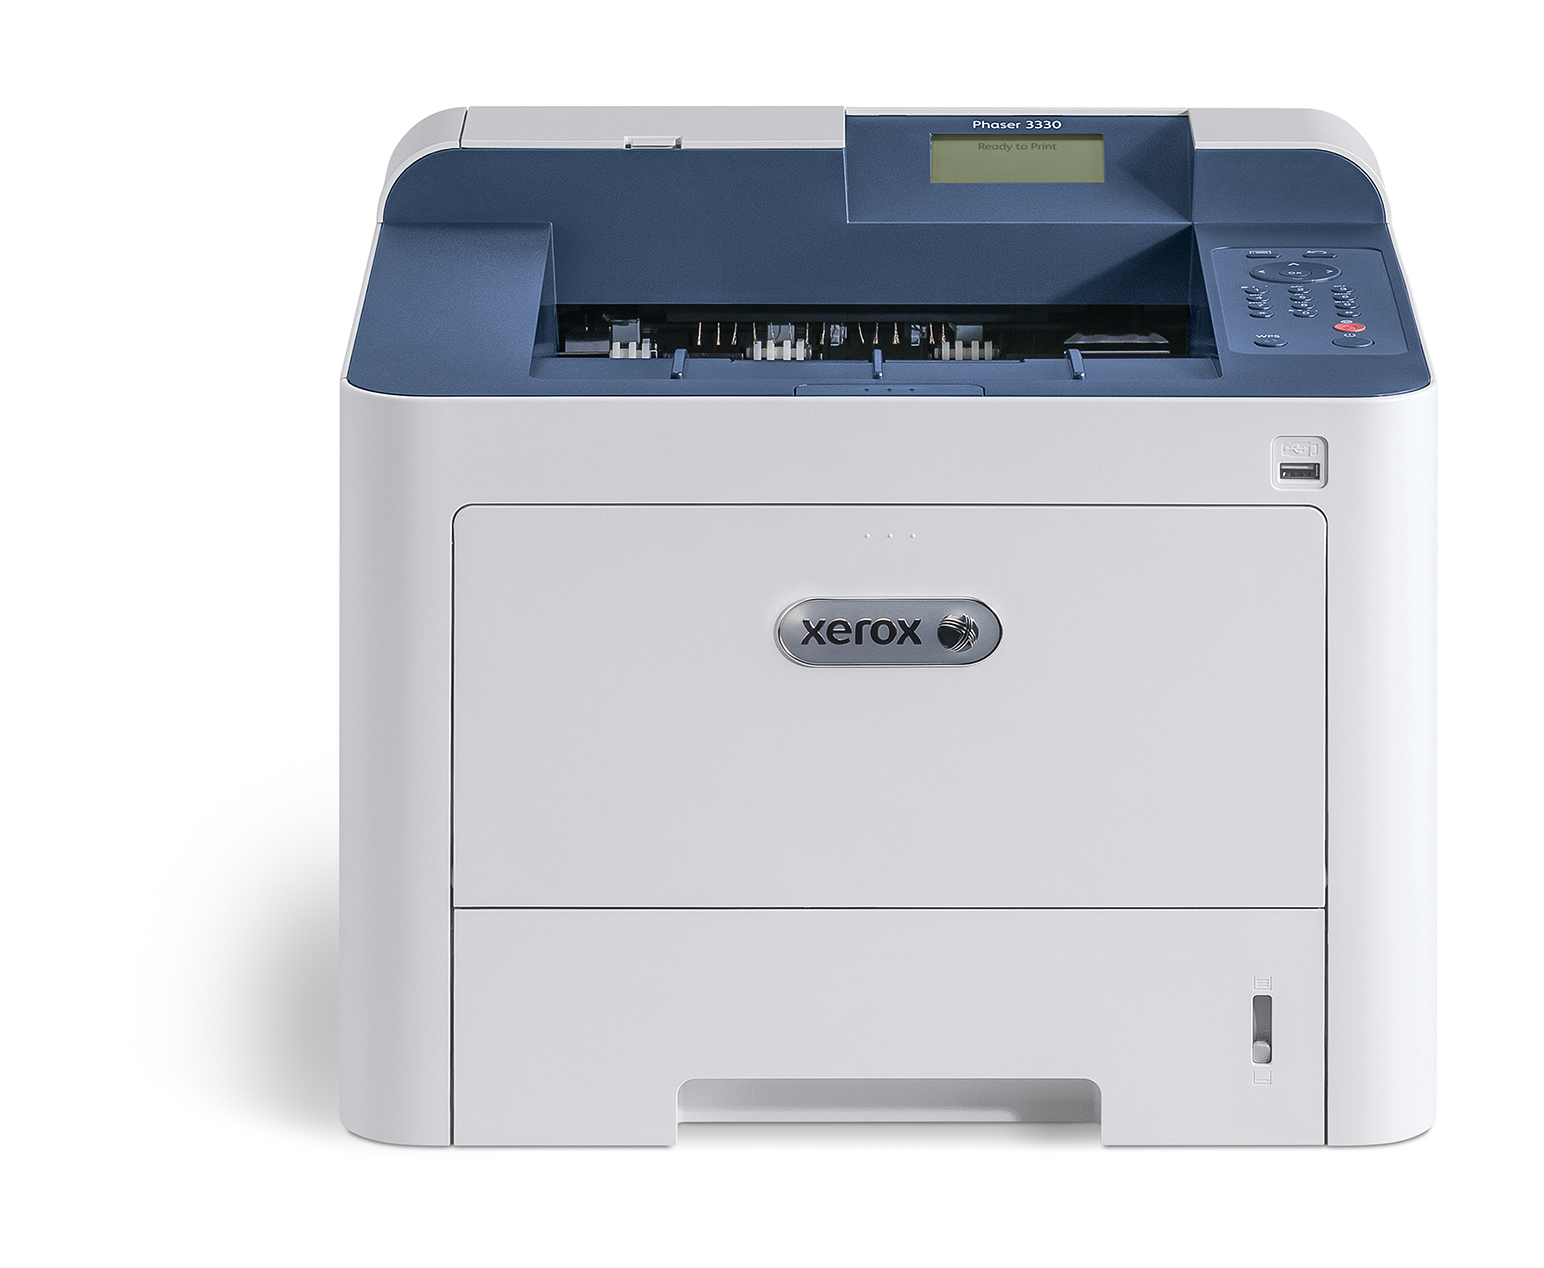 Phaser 3330 A4 40ppm Impresora Inalámbrica Doble Cara Ps3 Pcl5e/6 2 Bandejas Total 300 Hojas